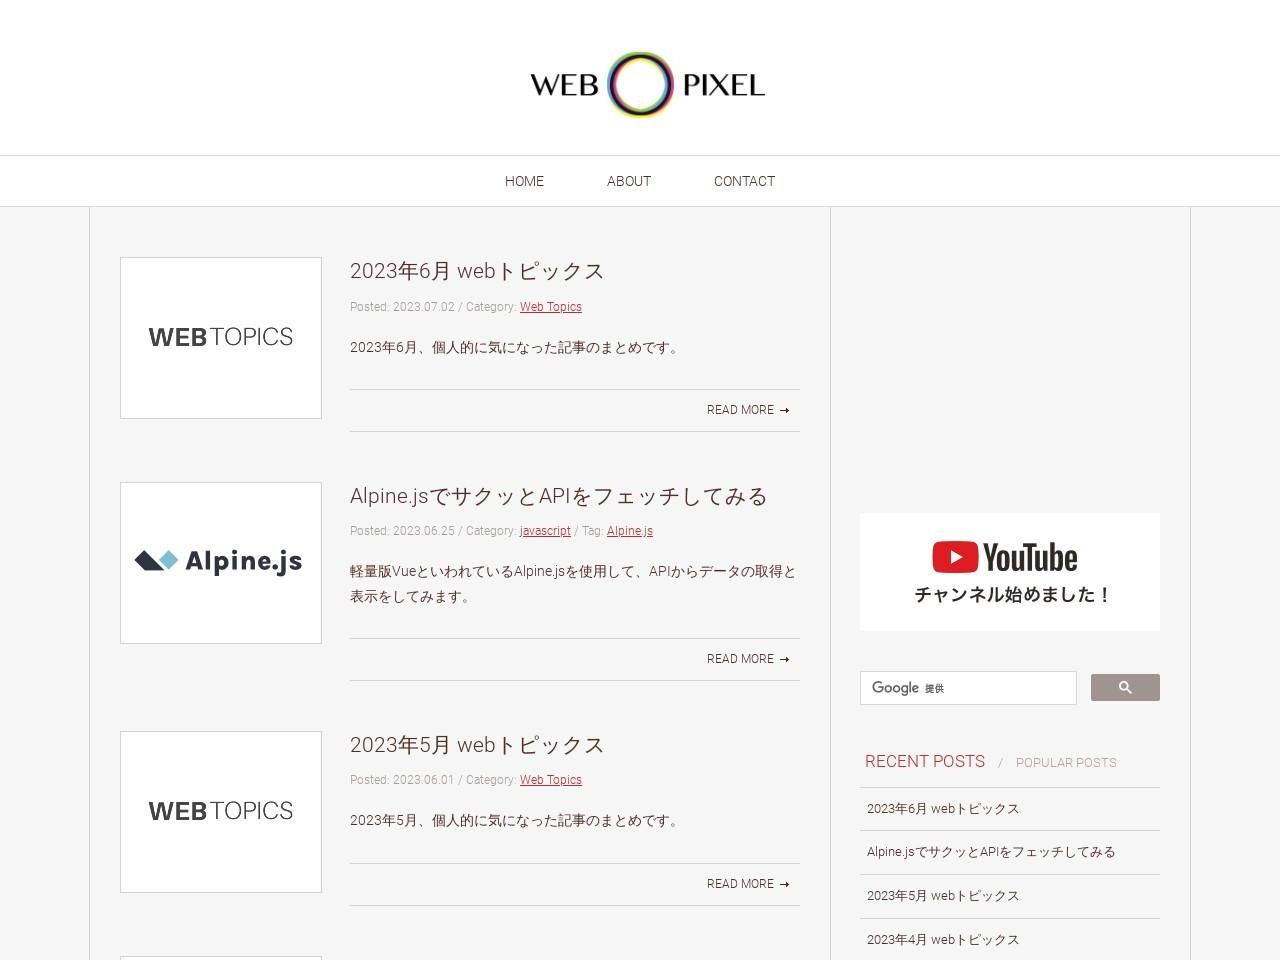 http://www.webopixel.net/blog/wp-content/uploads/2013/04/pshotoshop-s.jpg